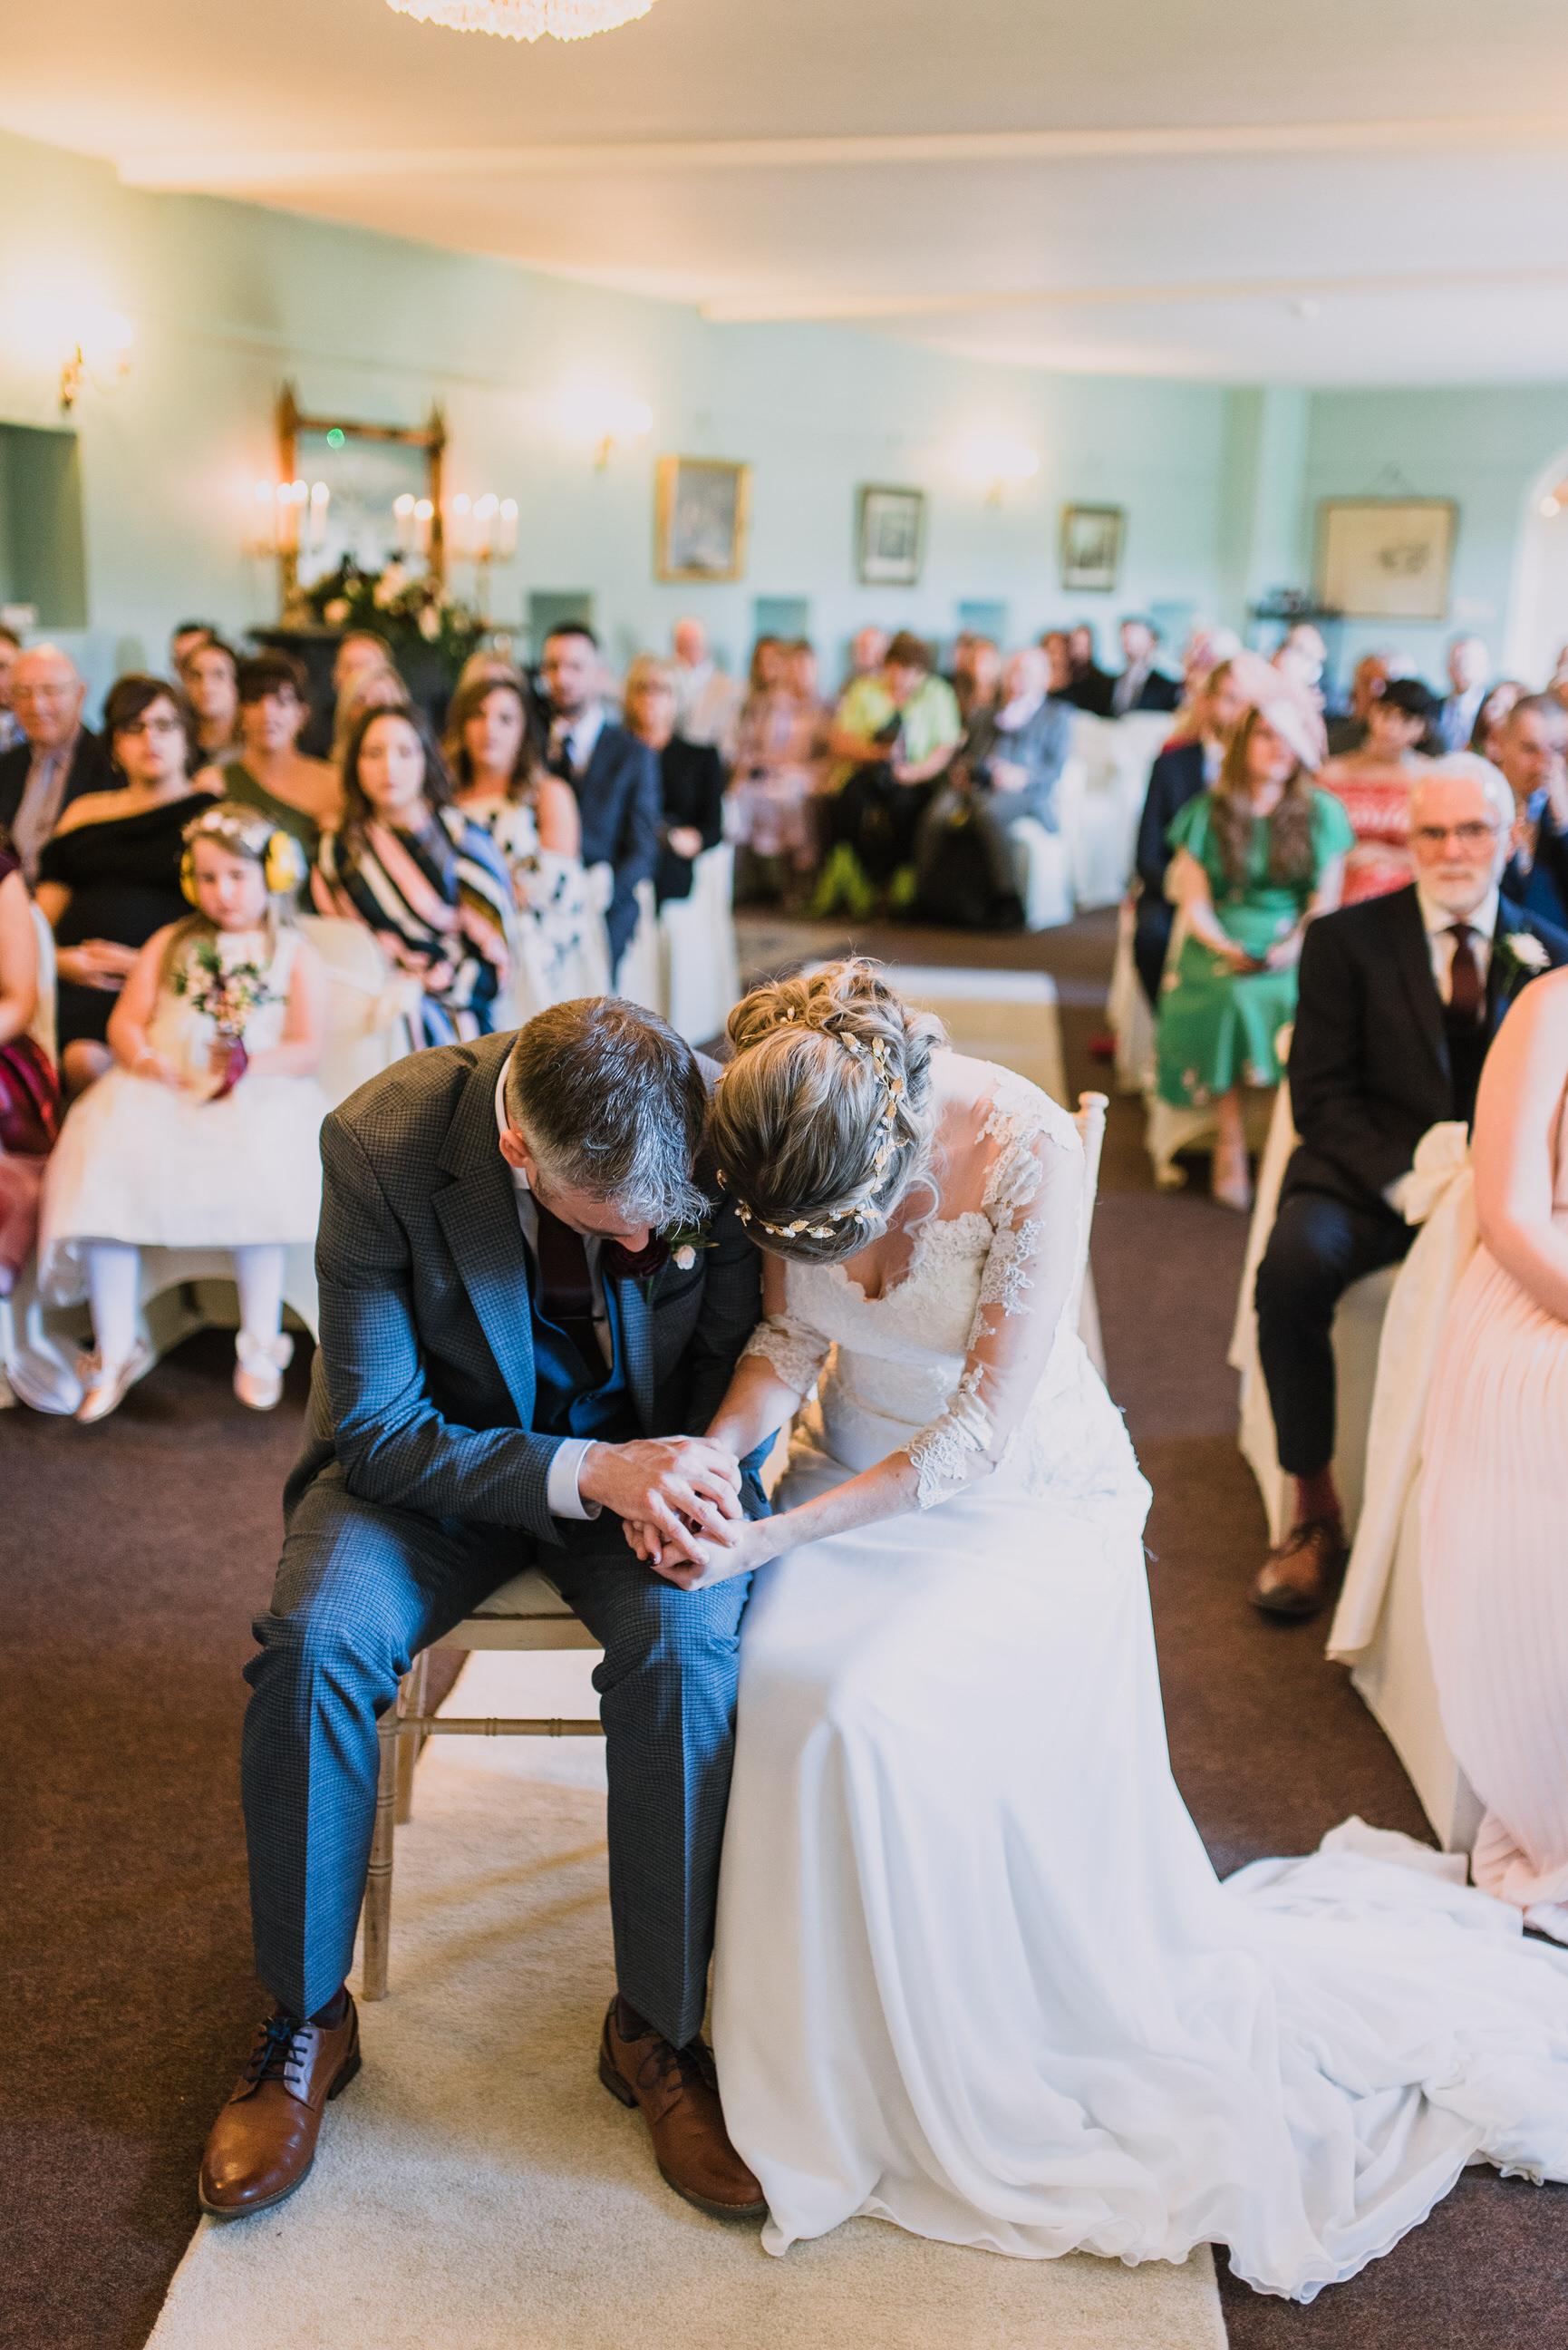 lissanoure castle wedding, northern ireland wedding photographer, romantic northern irish wedding venue, castle wedding ireland, natural wedding photography ni (61).jpg